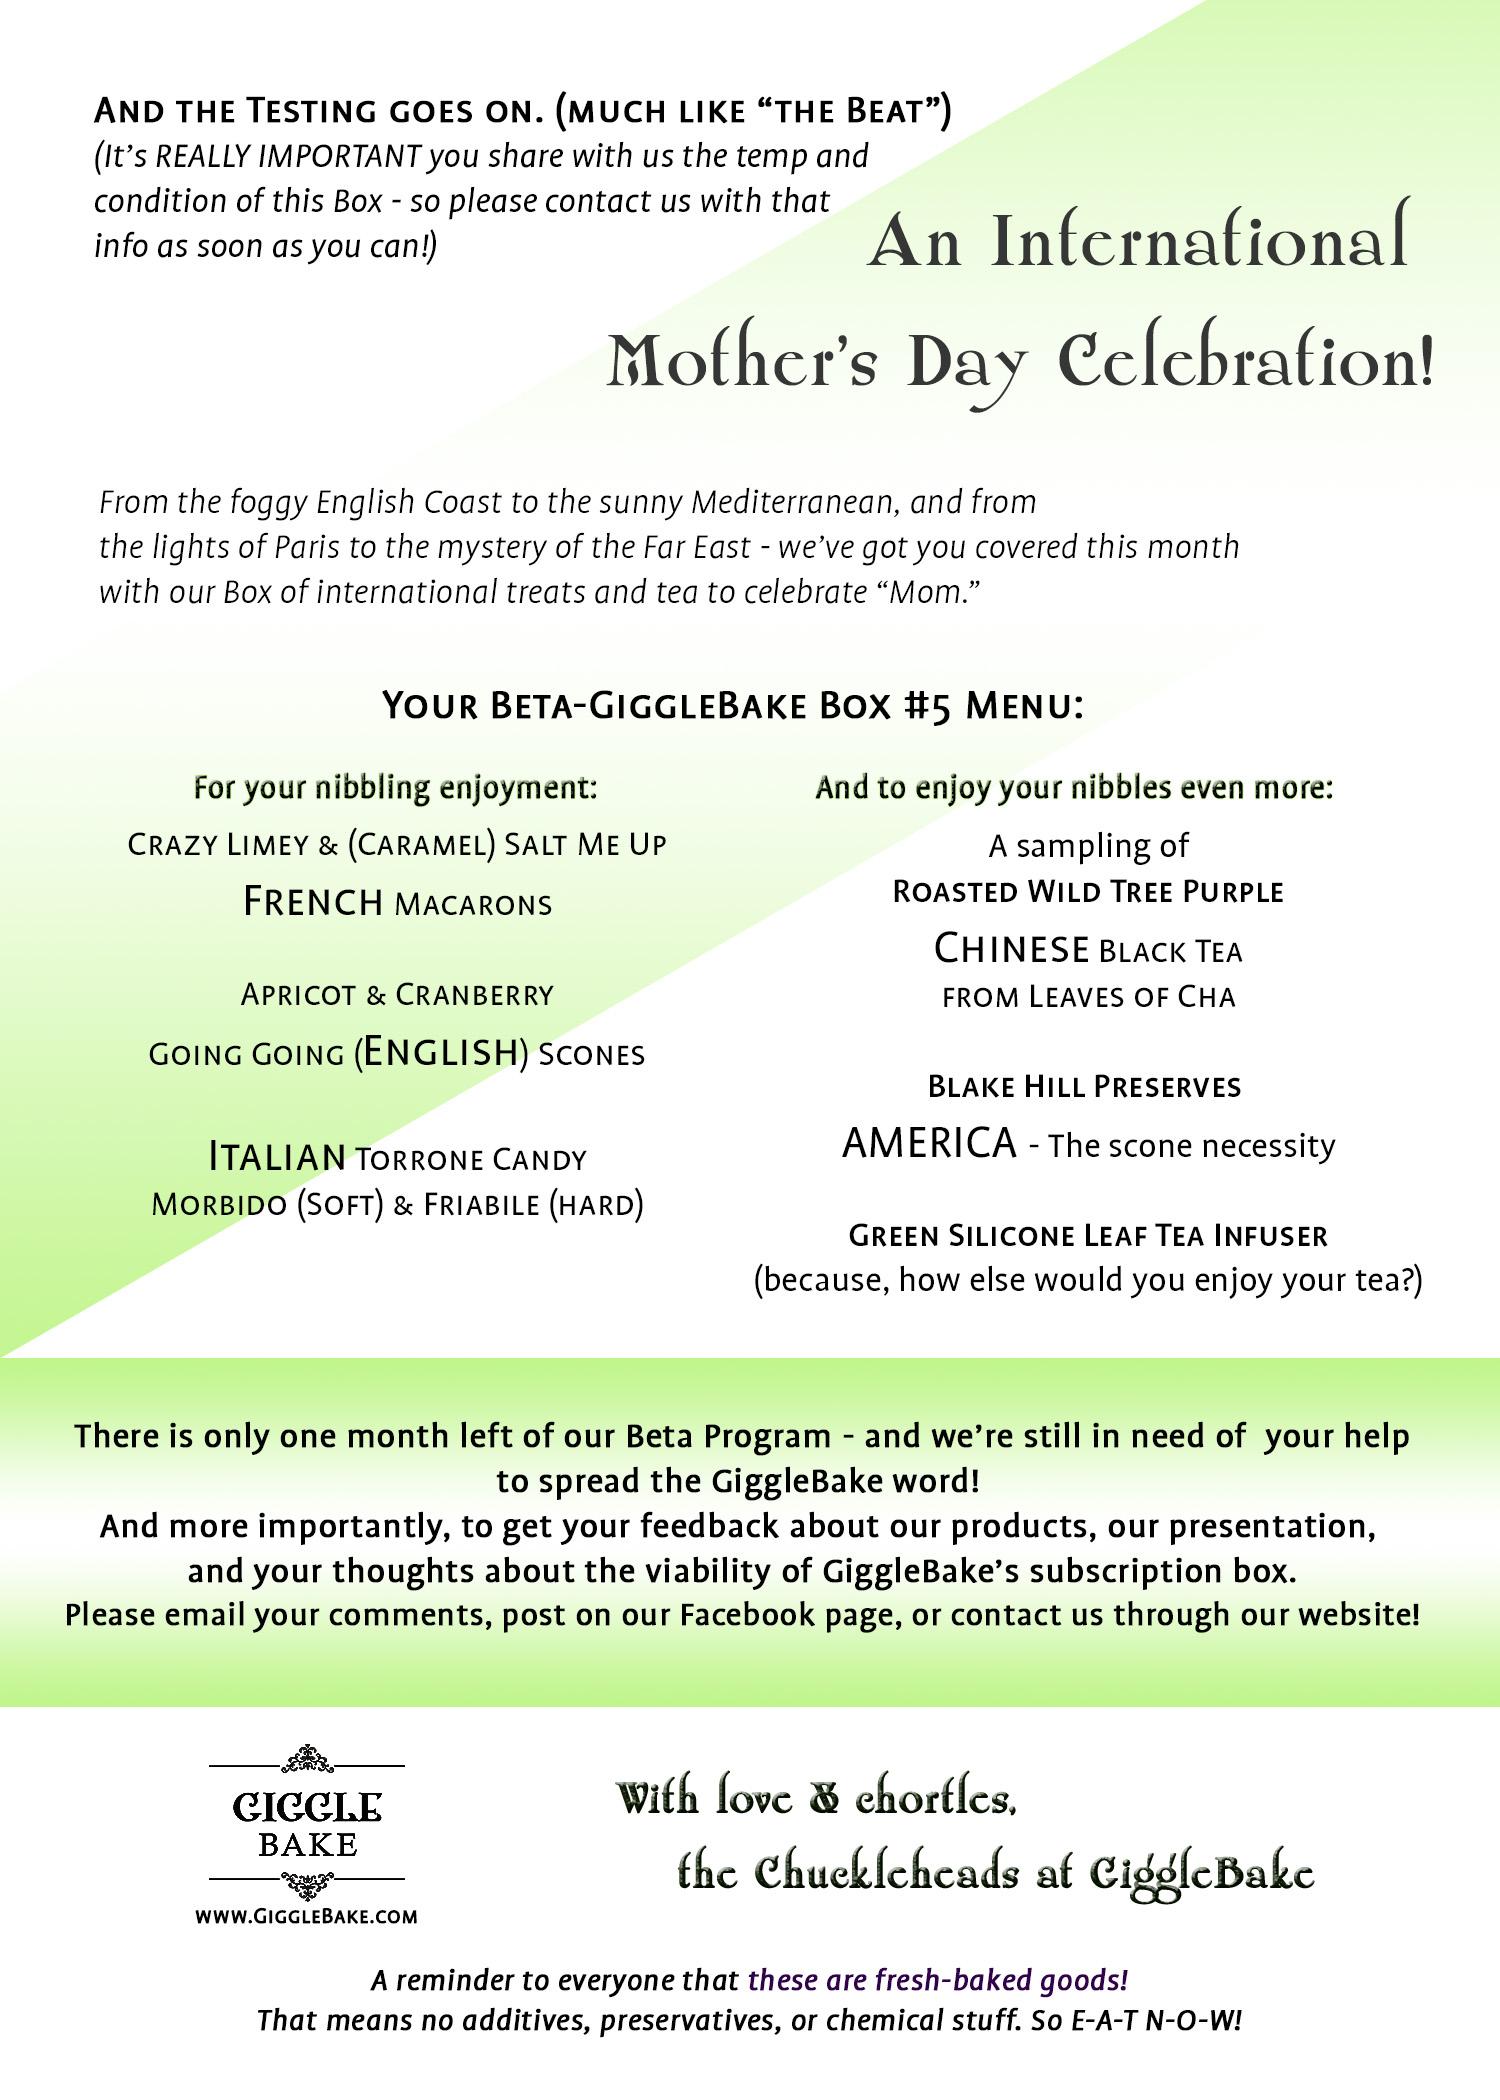 International Mother's Day Box Menu